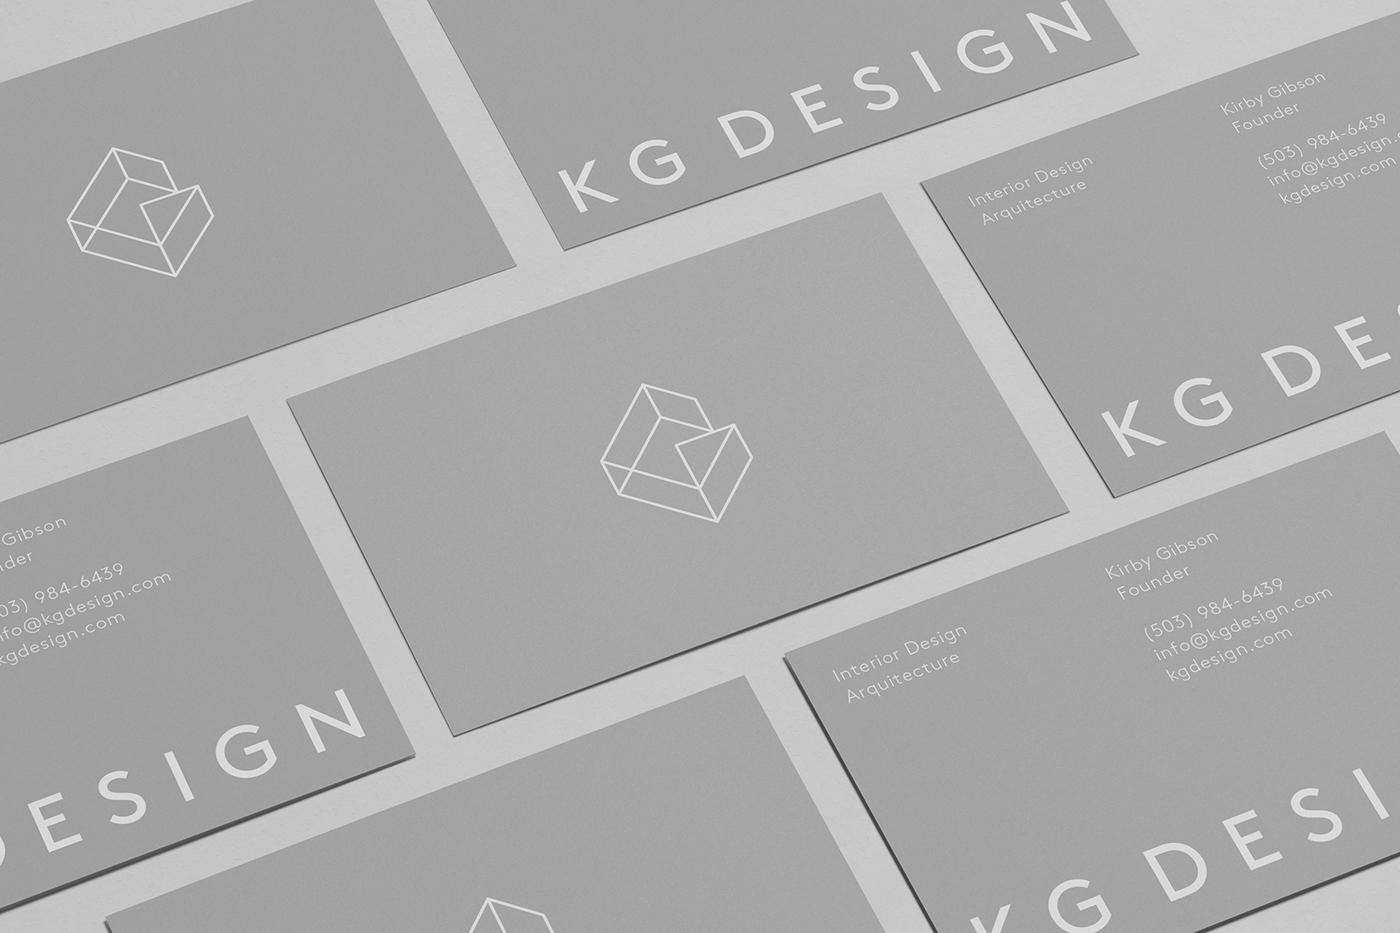 Interior Design Branding Unique Kg Design Branding  Mindsparkle Mag Design Decoration